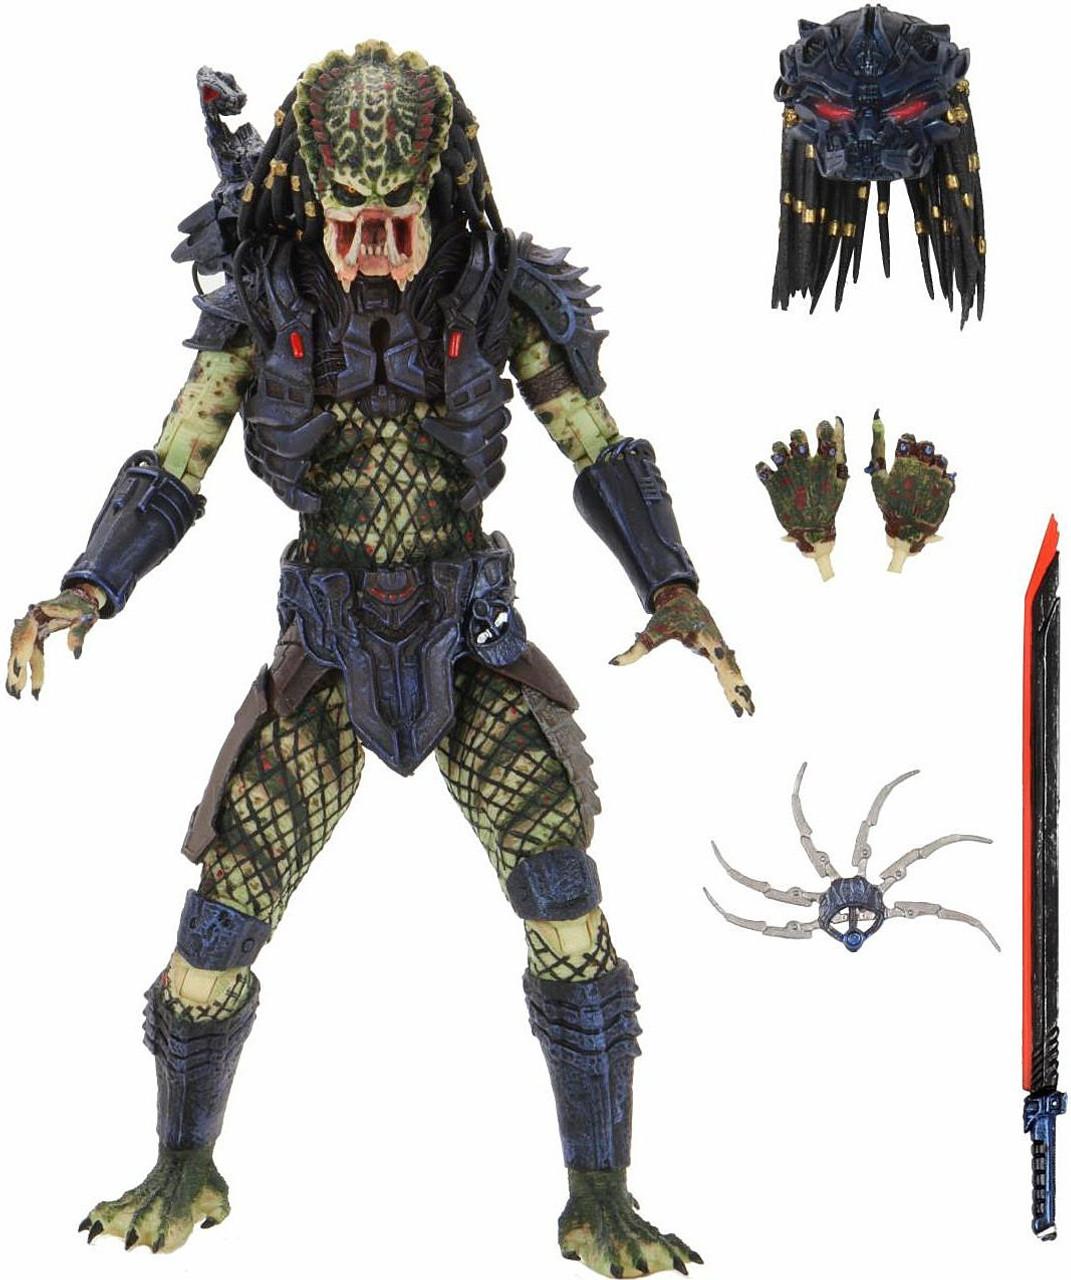 Pre-Order • NEW /& OFFICIAL • Ultimate City Hunter Predator 2 A//Figure NECA